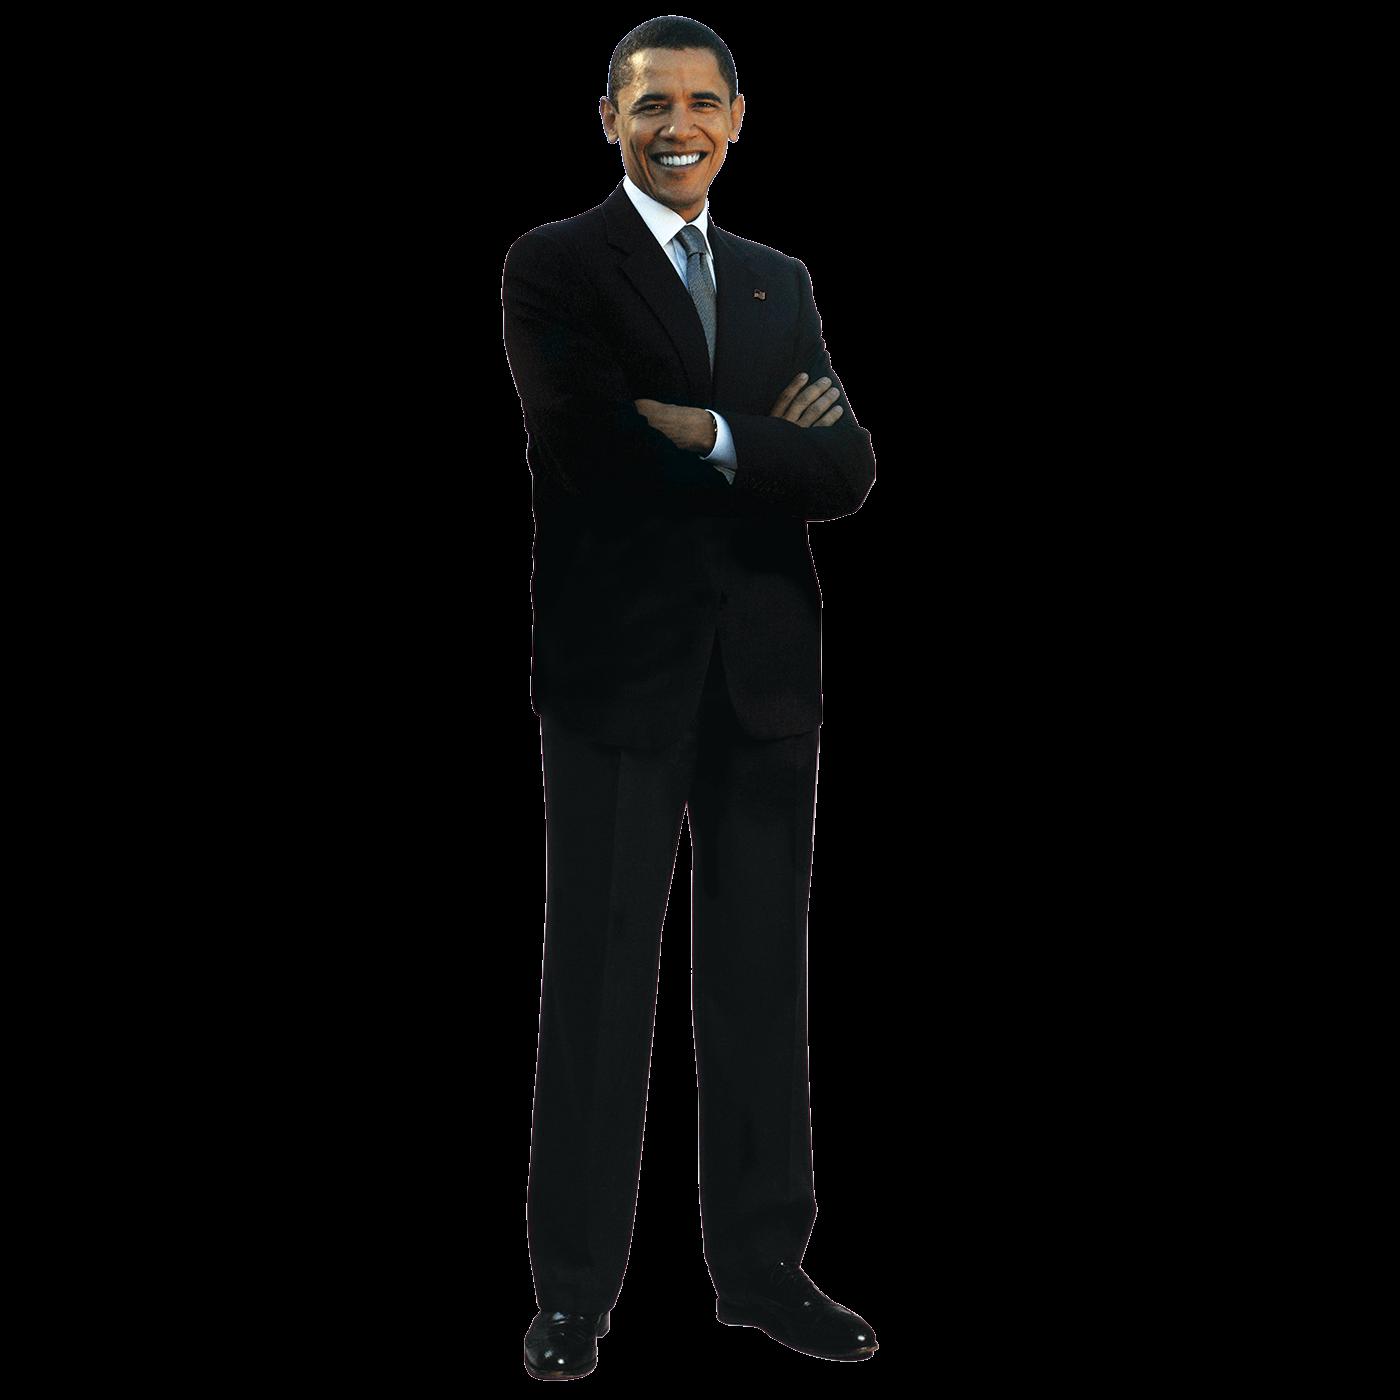 Standing Obama - Barack Obama, Transparent background PNG HD thumbnail